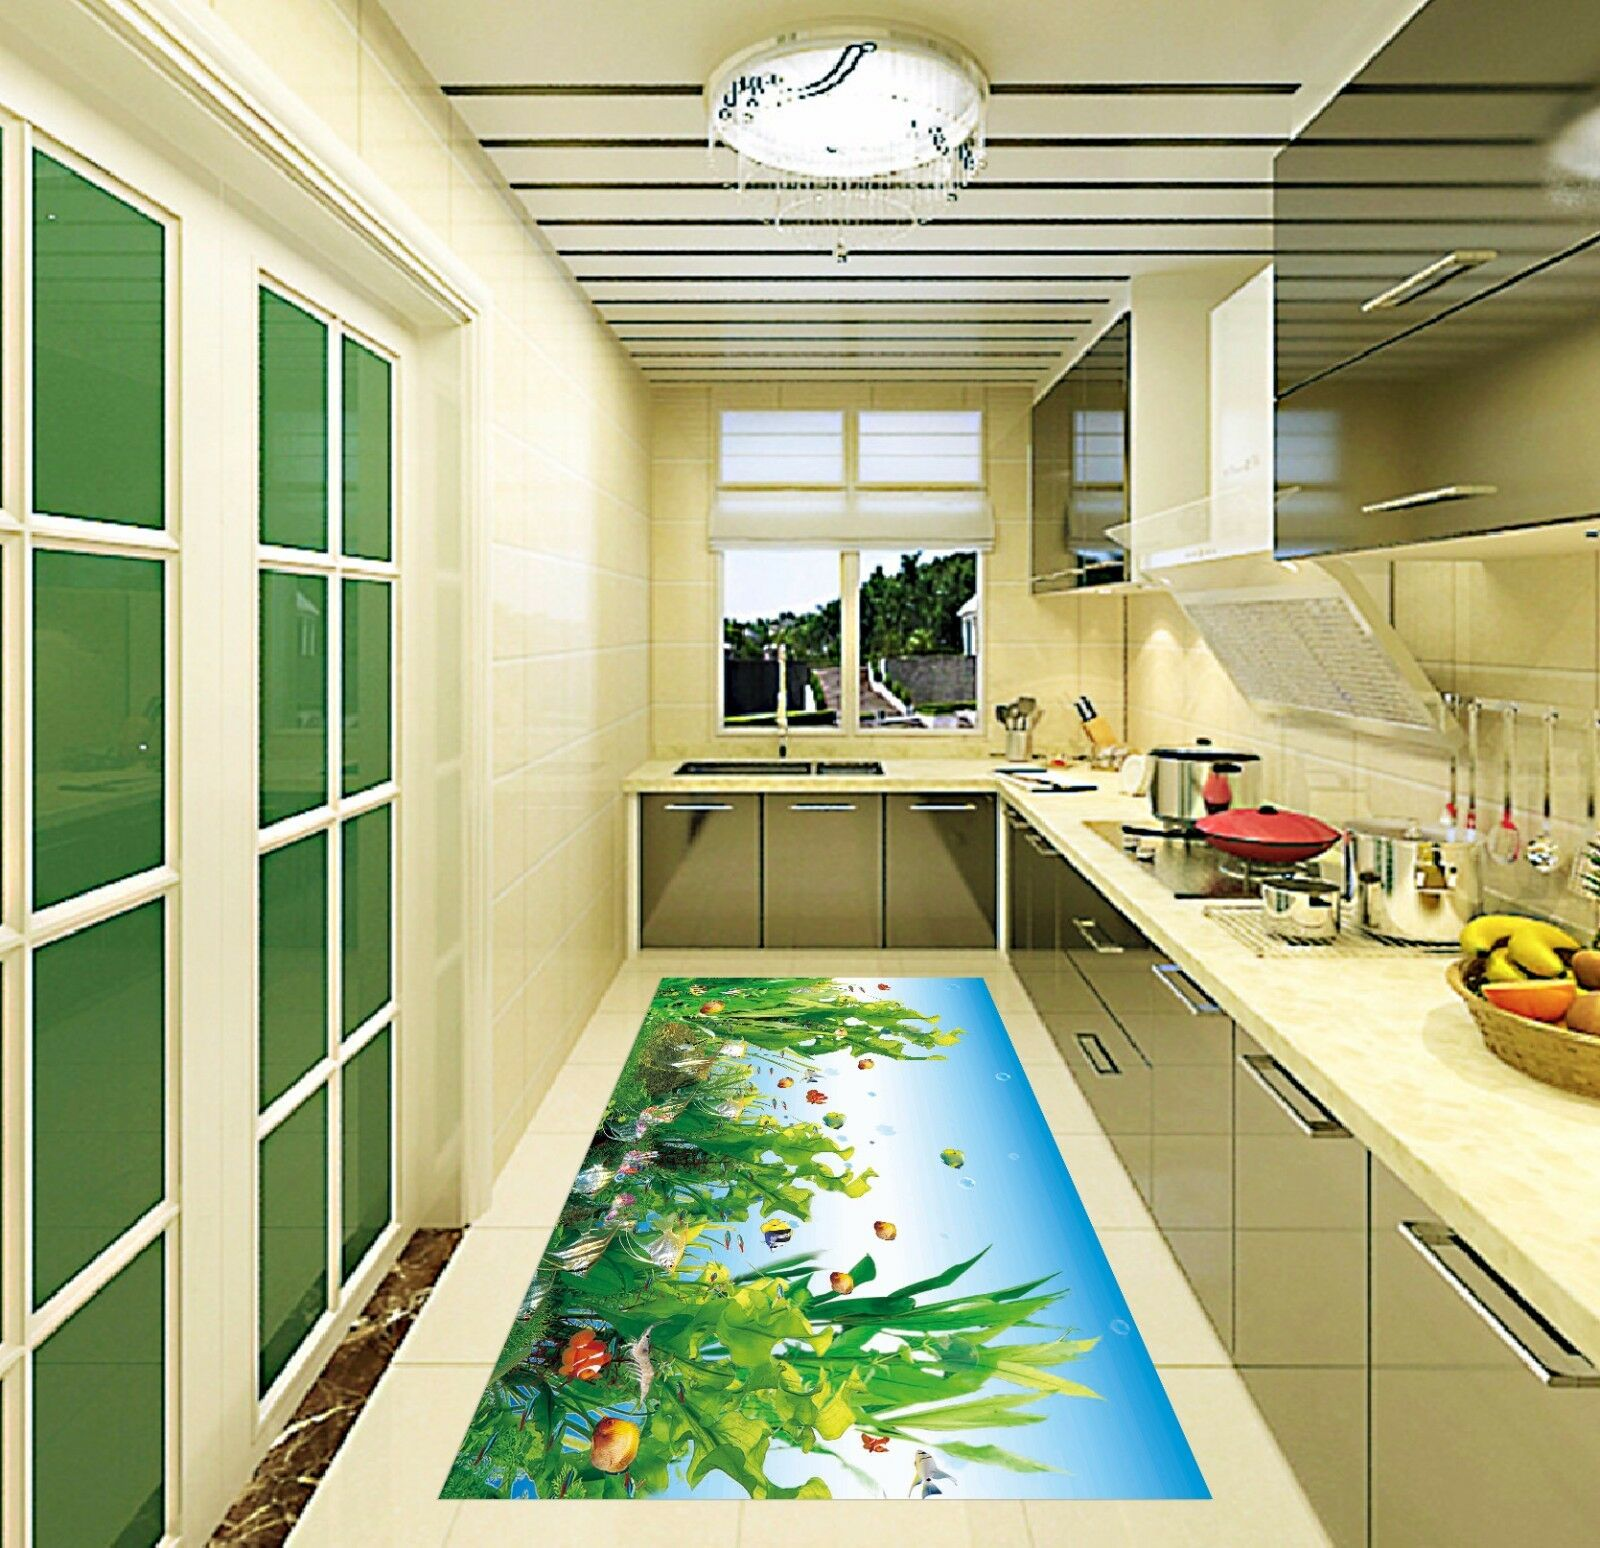 3D Seaweed 726 Kitchen Mat Mat Mat Floor Murals Wall Print Wall AJ WALLPAPER UK Kyra ab5ad3